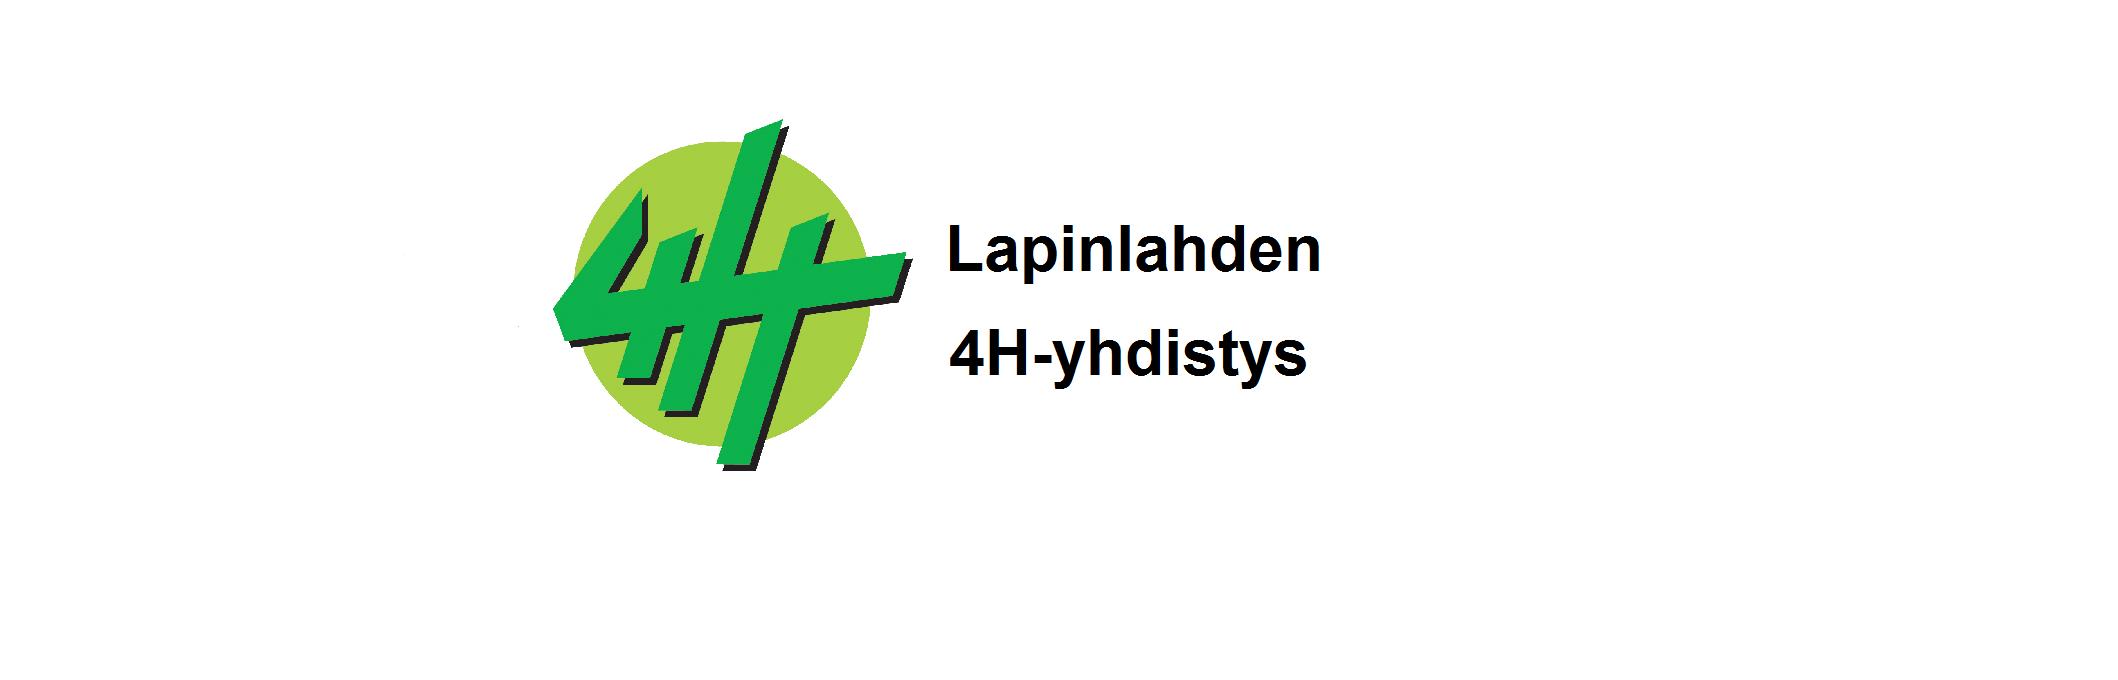 Lapinlahden 4H-yhdistys ry.